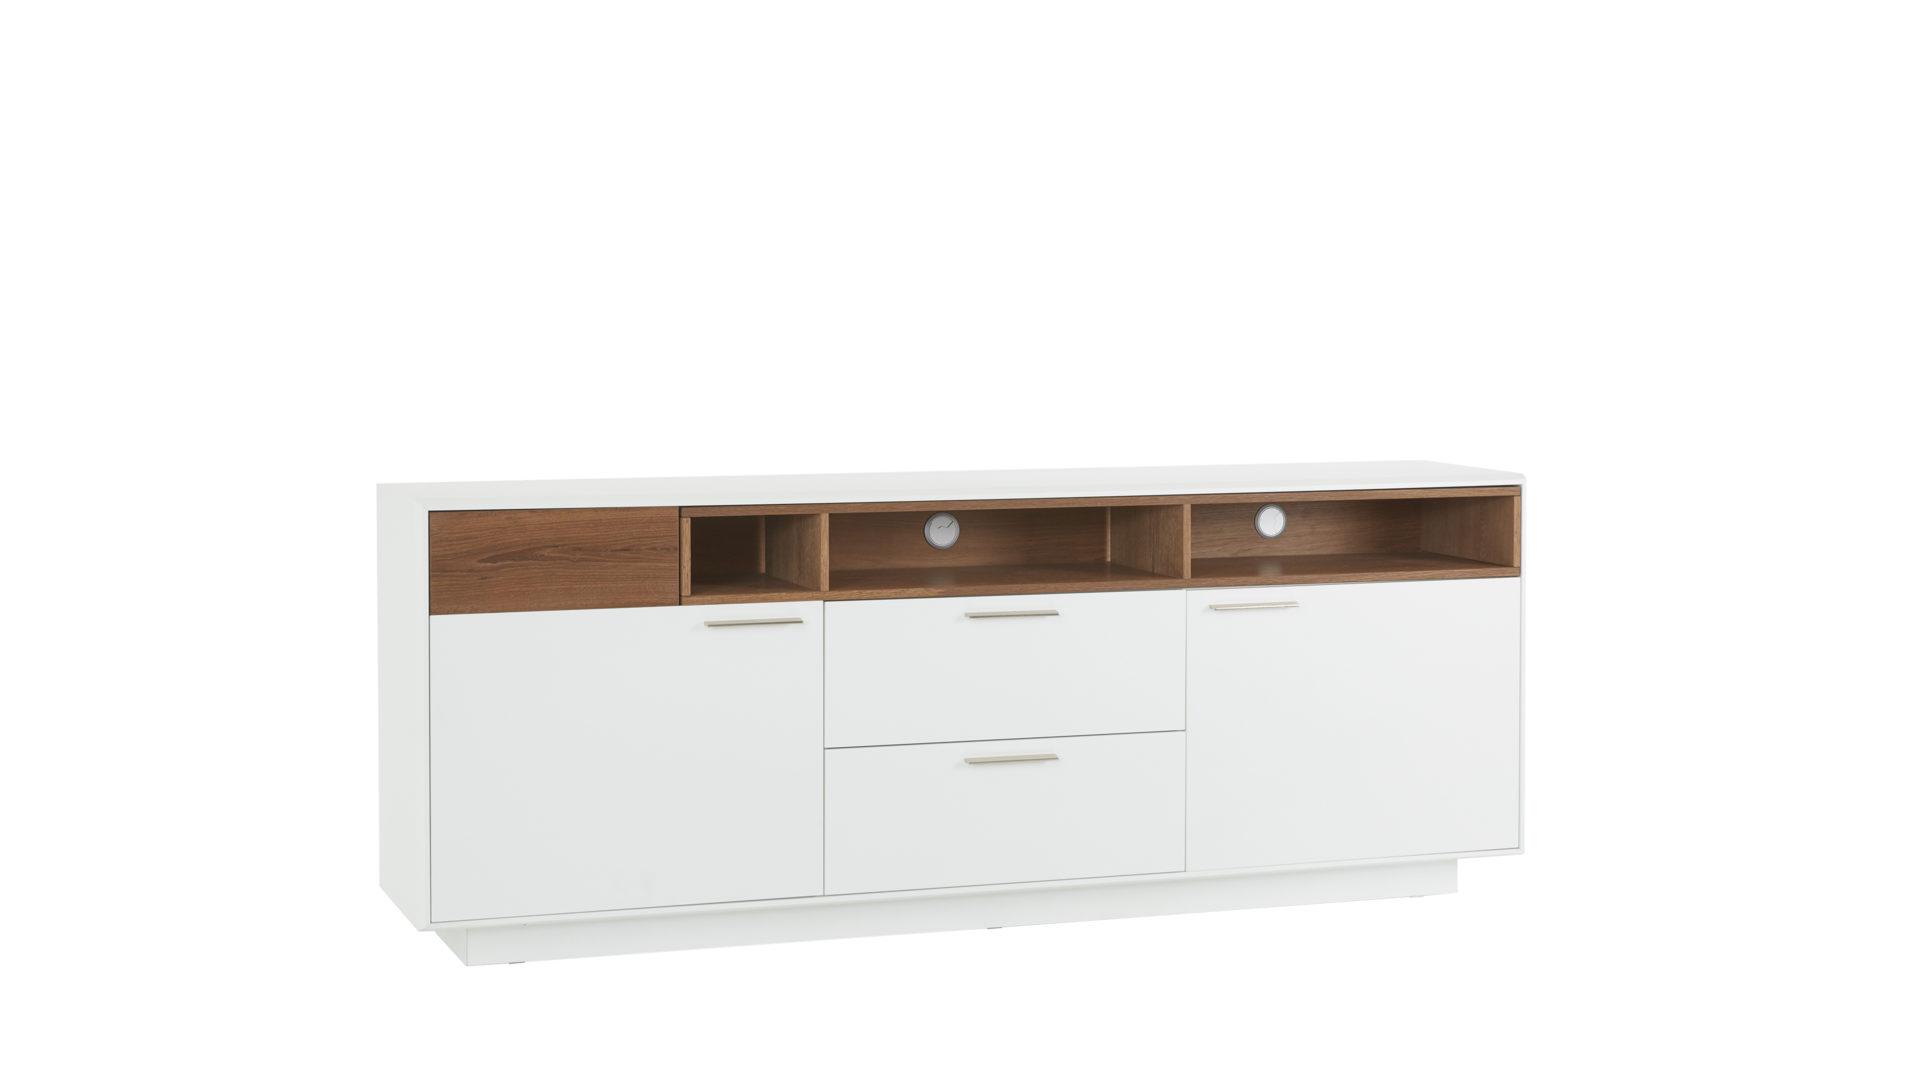 Interliving Wohnzimmer Serie 2102 Sideboard 510266 Dunkles